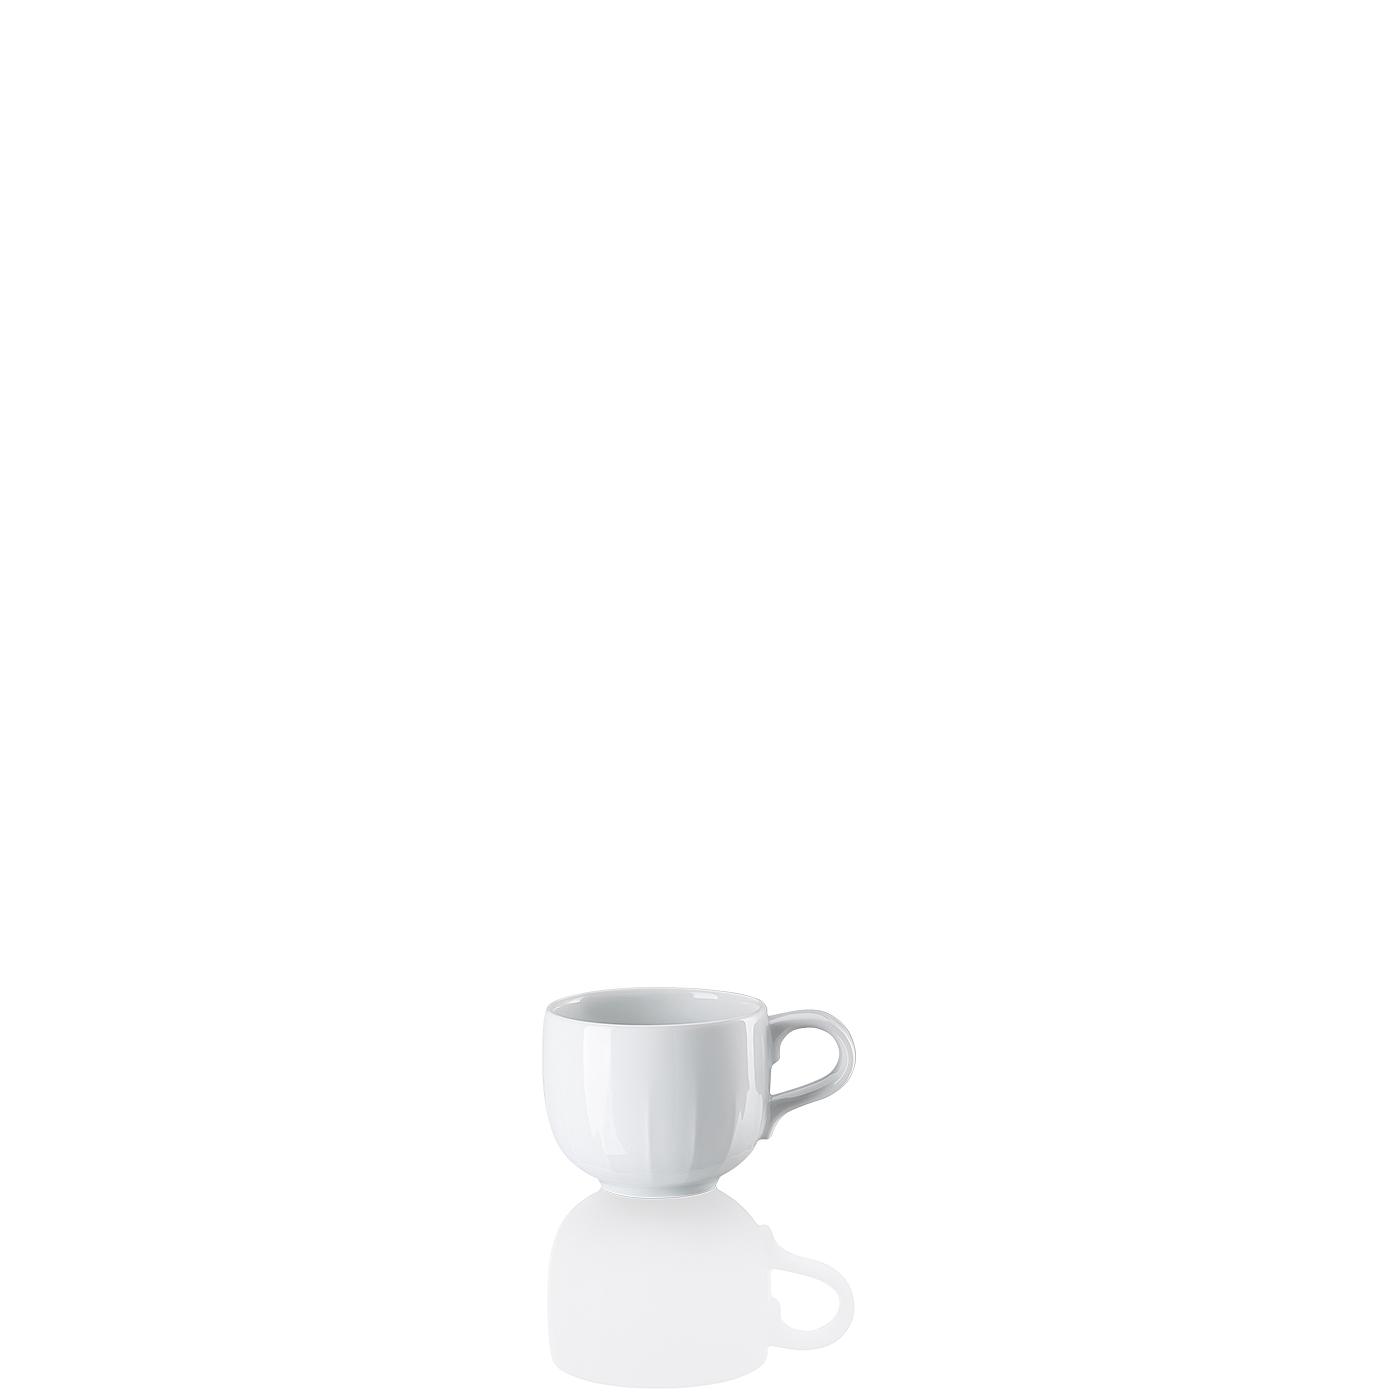 Espresso-Obertasse Joyn Weiß Arzberg